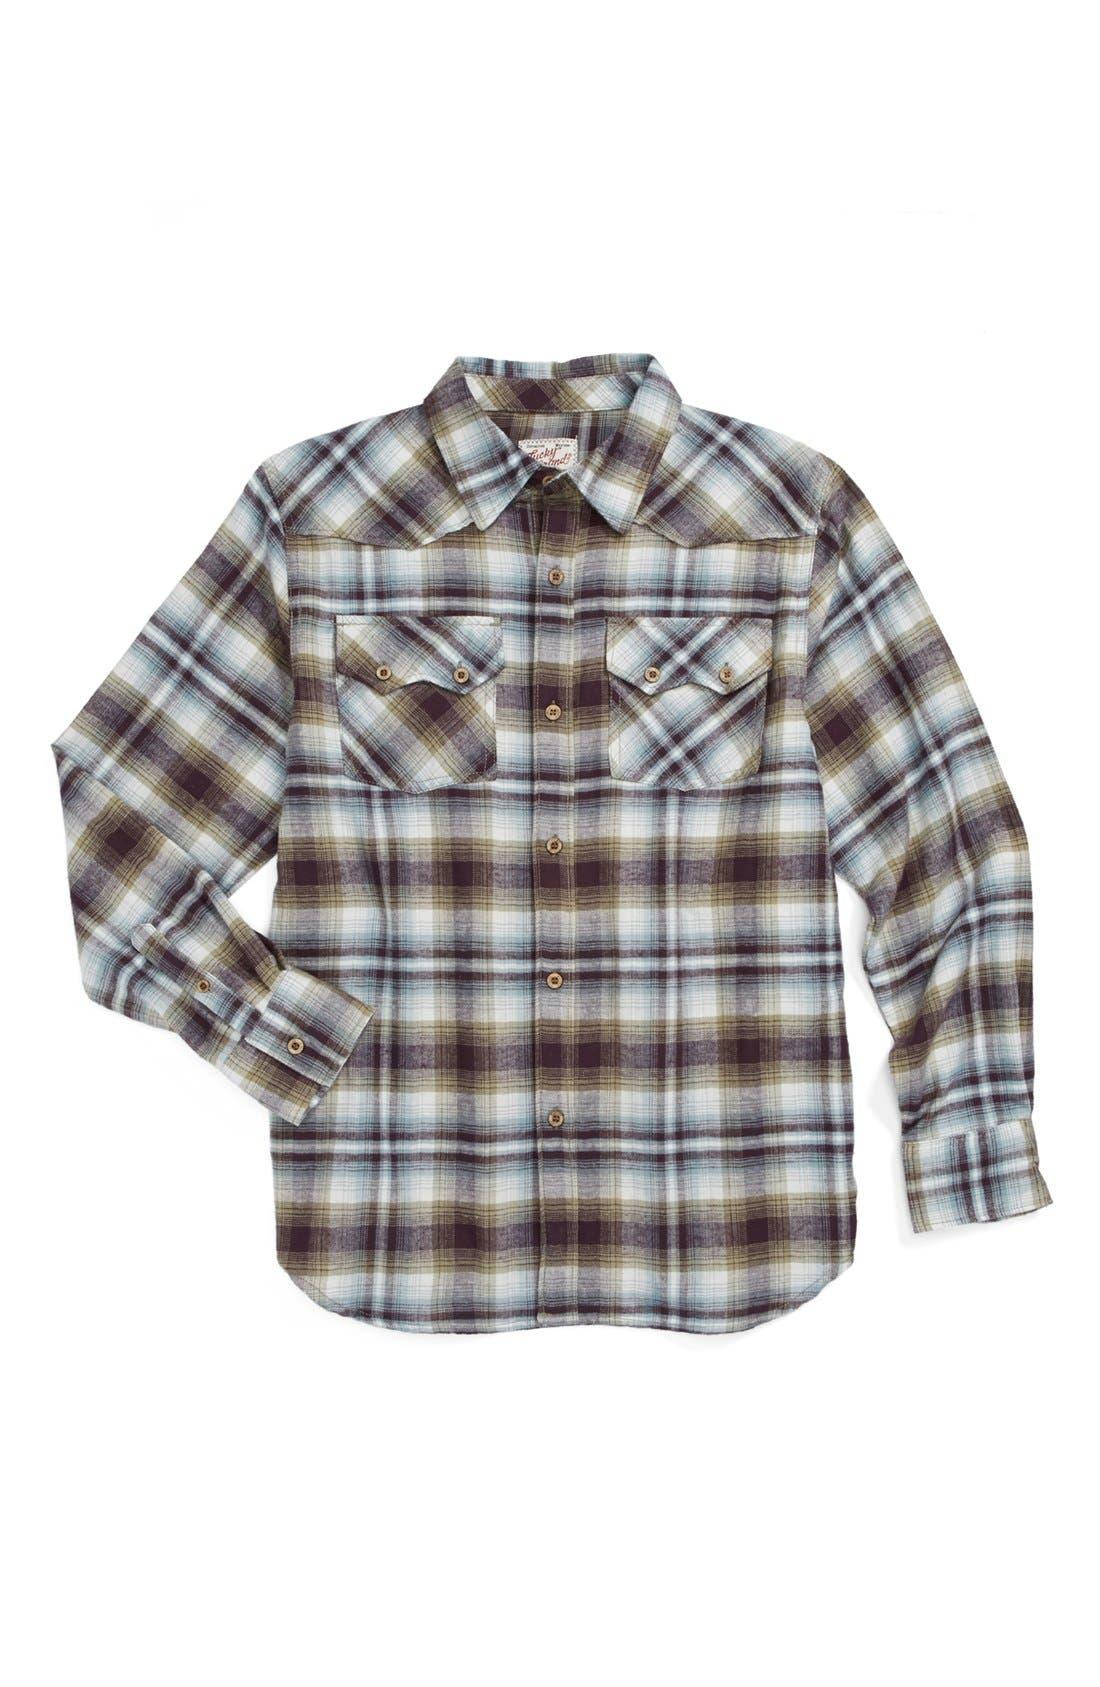 Main Image - Lucky Brand 'Speedster' Plaid Shirt (Big Boys)